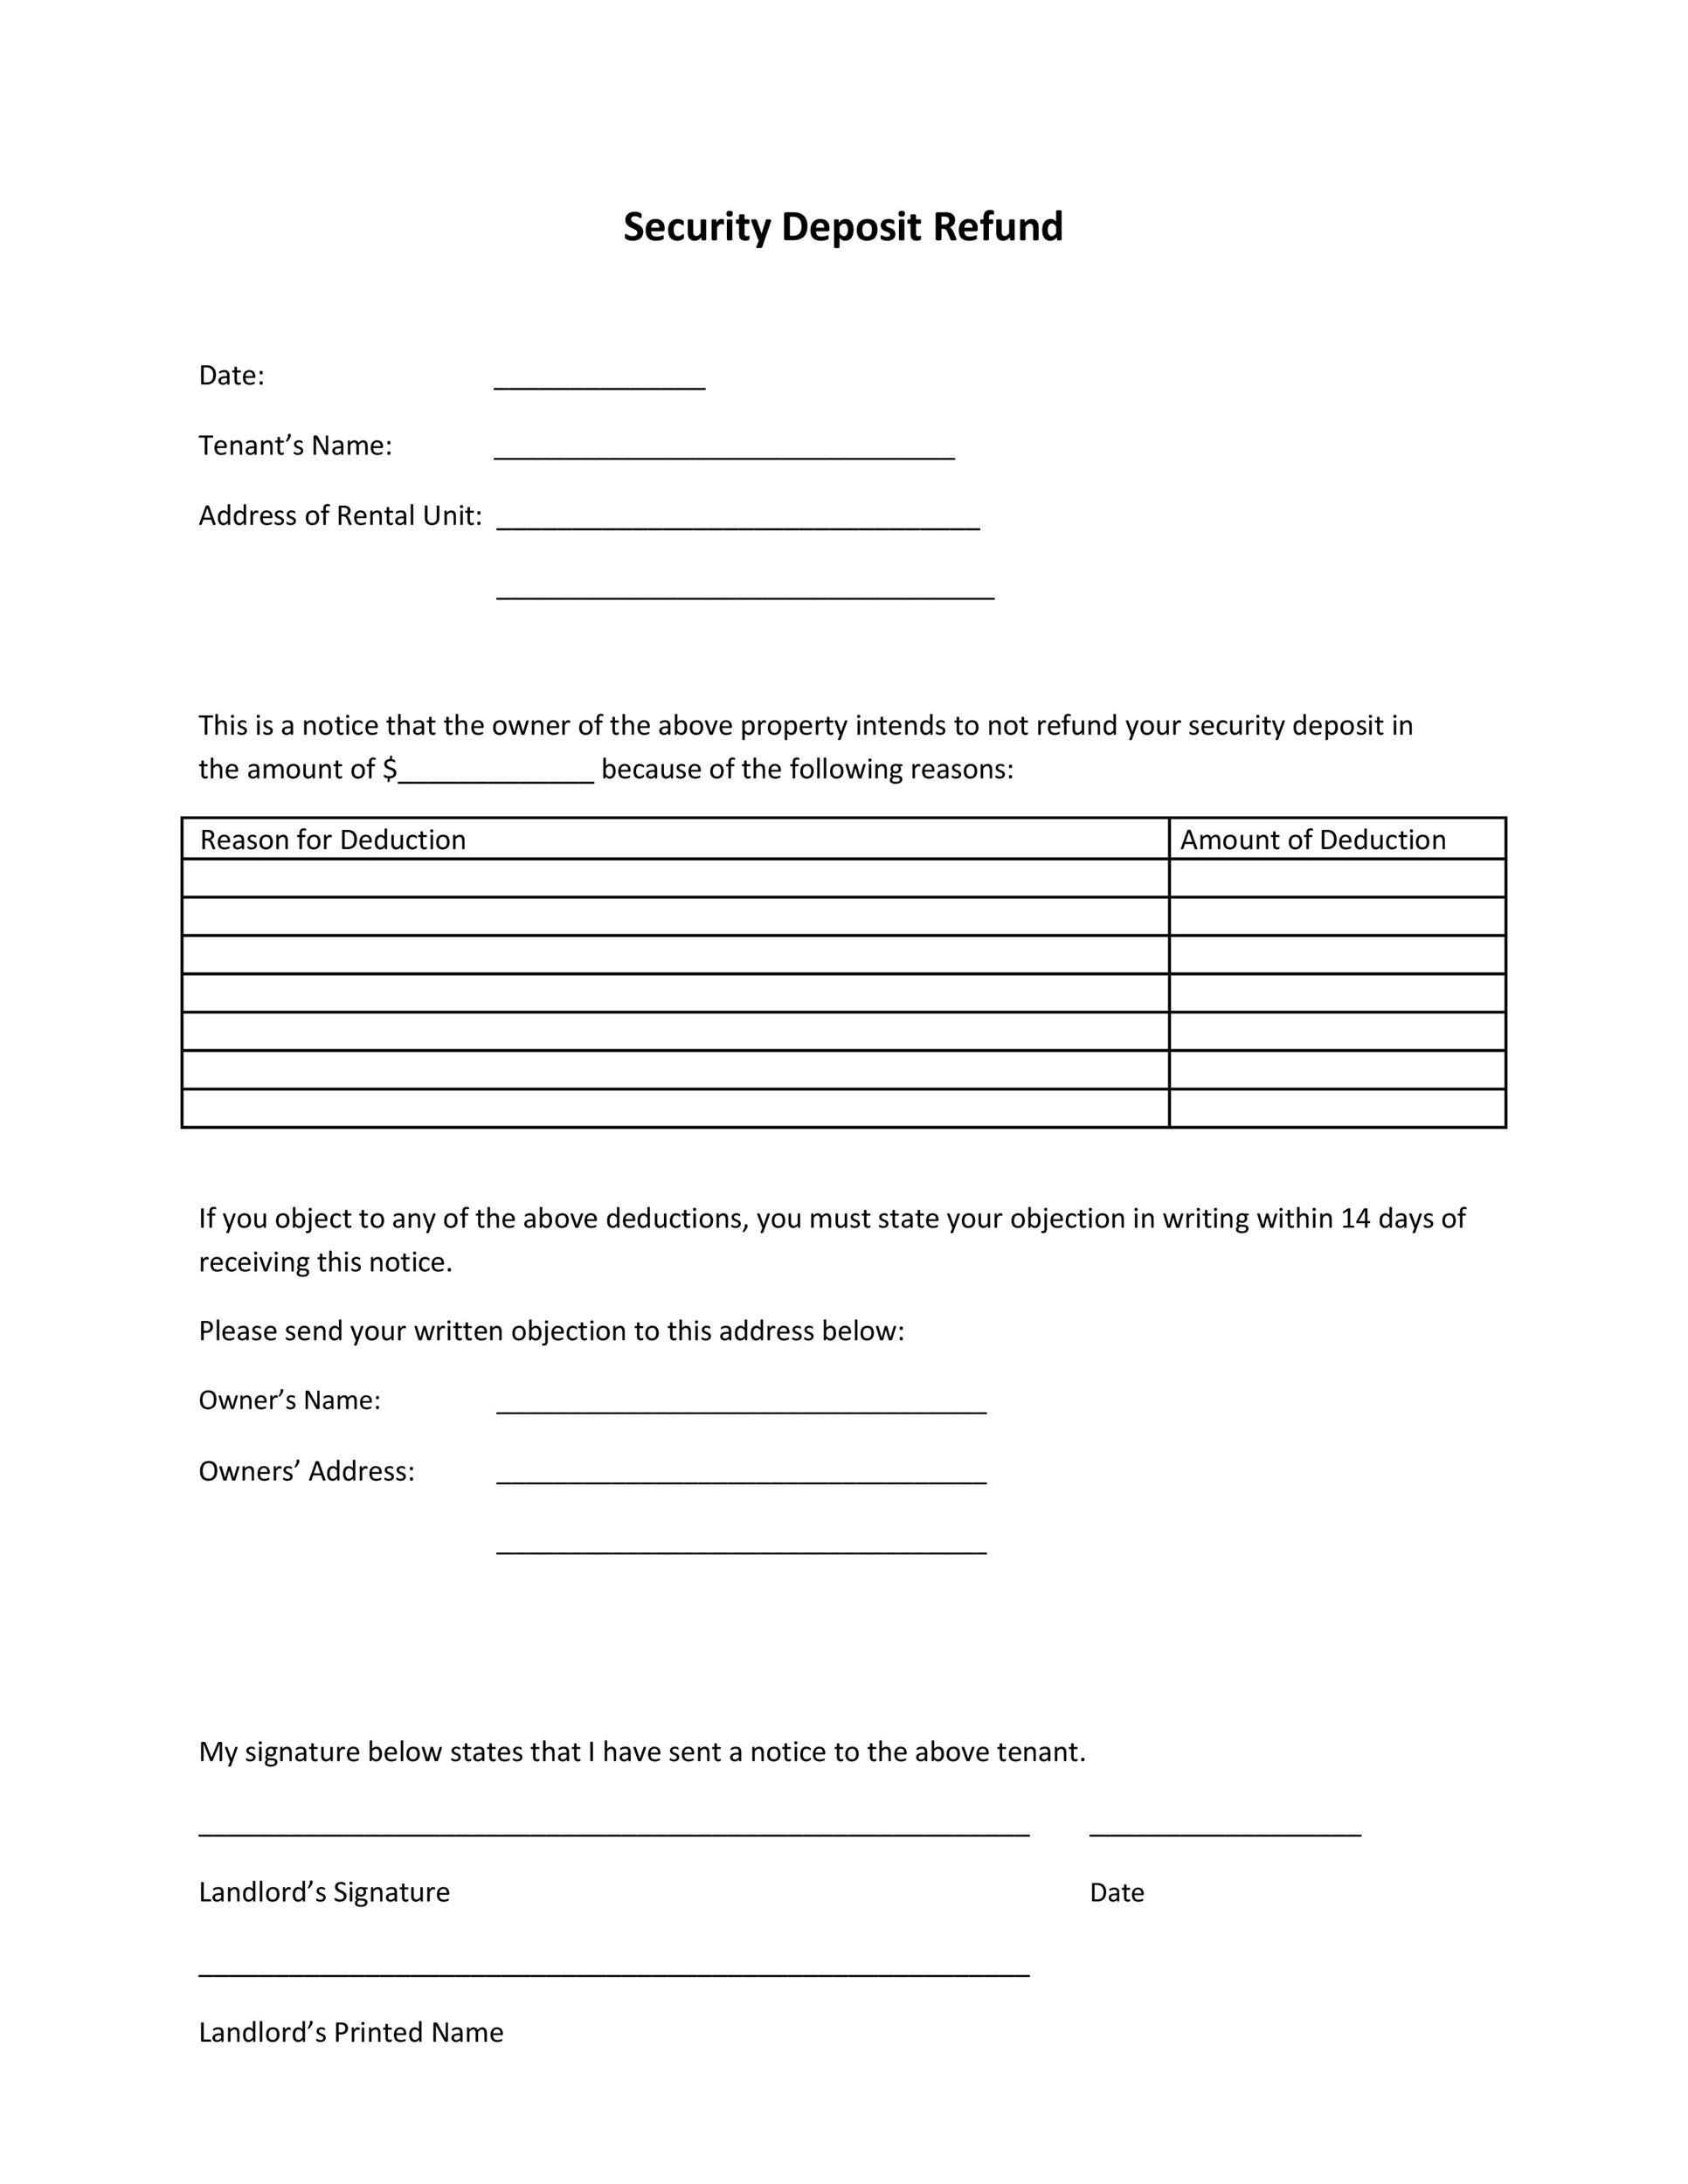 Landlord's letter returning security deposit & guide.